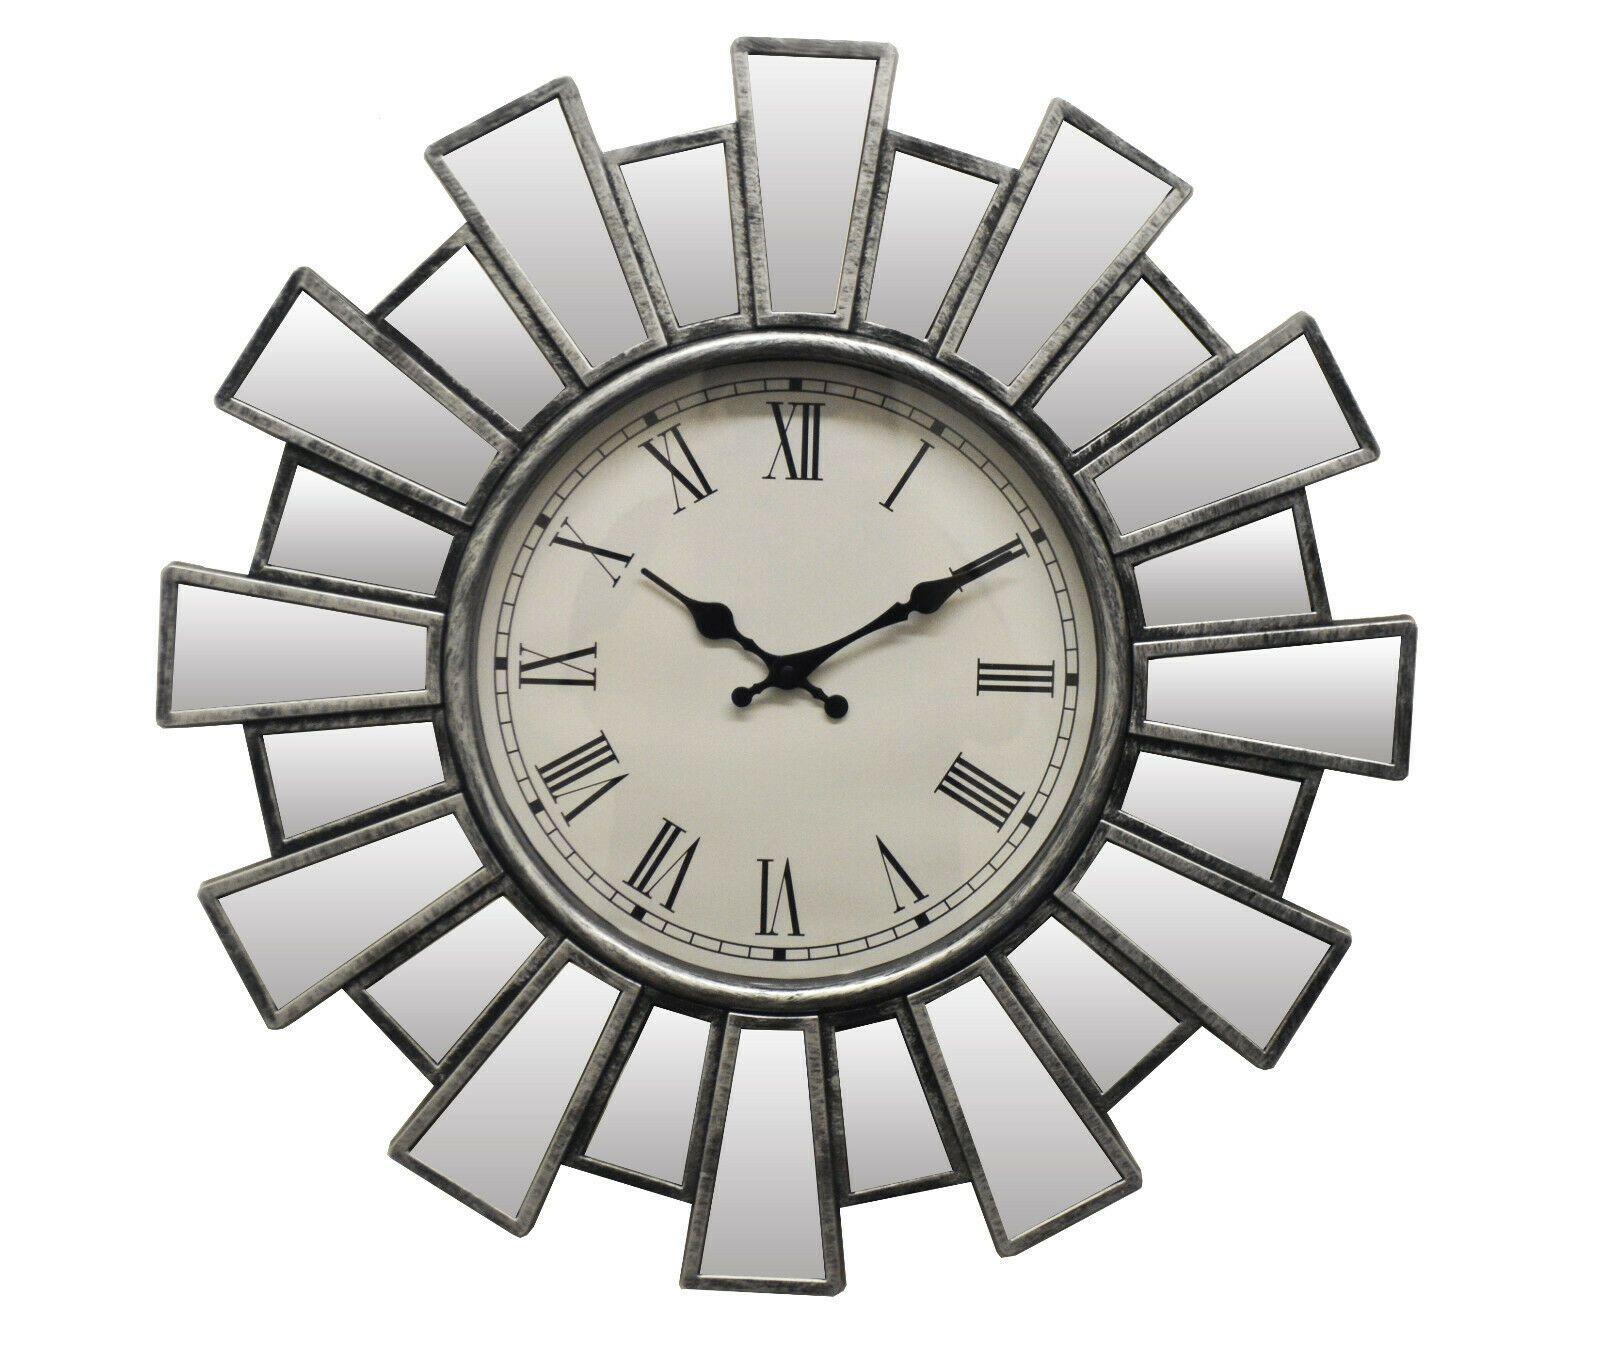 Silver And Mirror Sunburst Clock With Roman Numerals Clock Ideas Of Clock Clock Silver And Mirror Sunbur In 2020 Sunburst Wall Decor Wall Clock Sunburst Clock